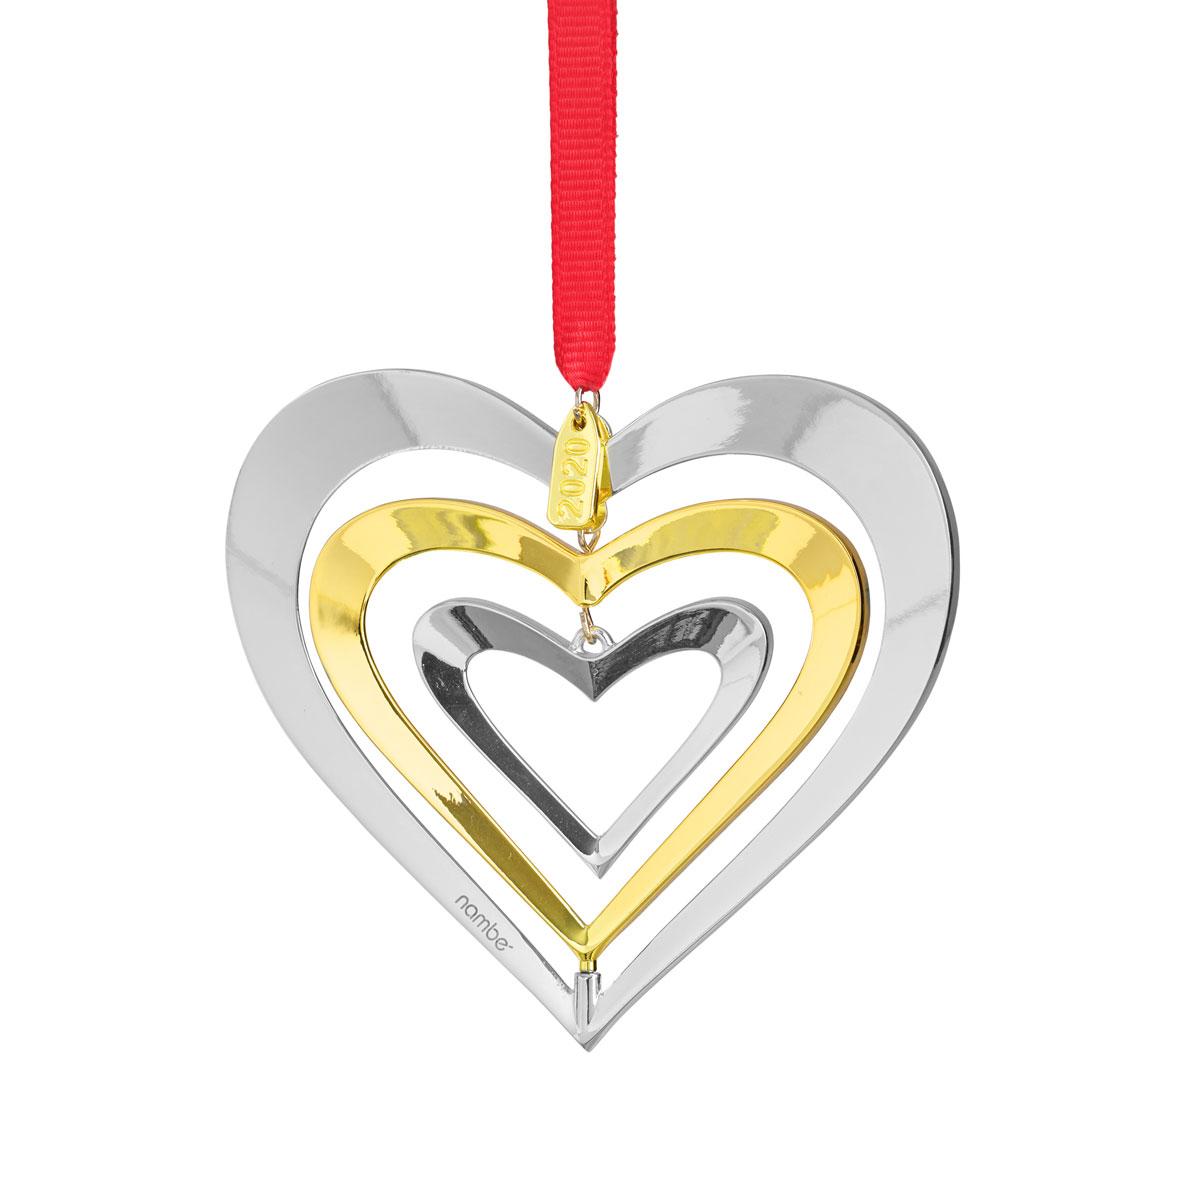 Nambe Heart Annual Ornament 2020